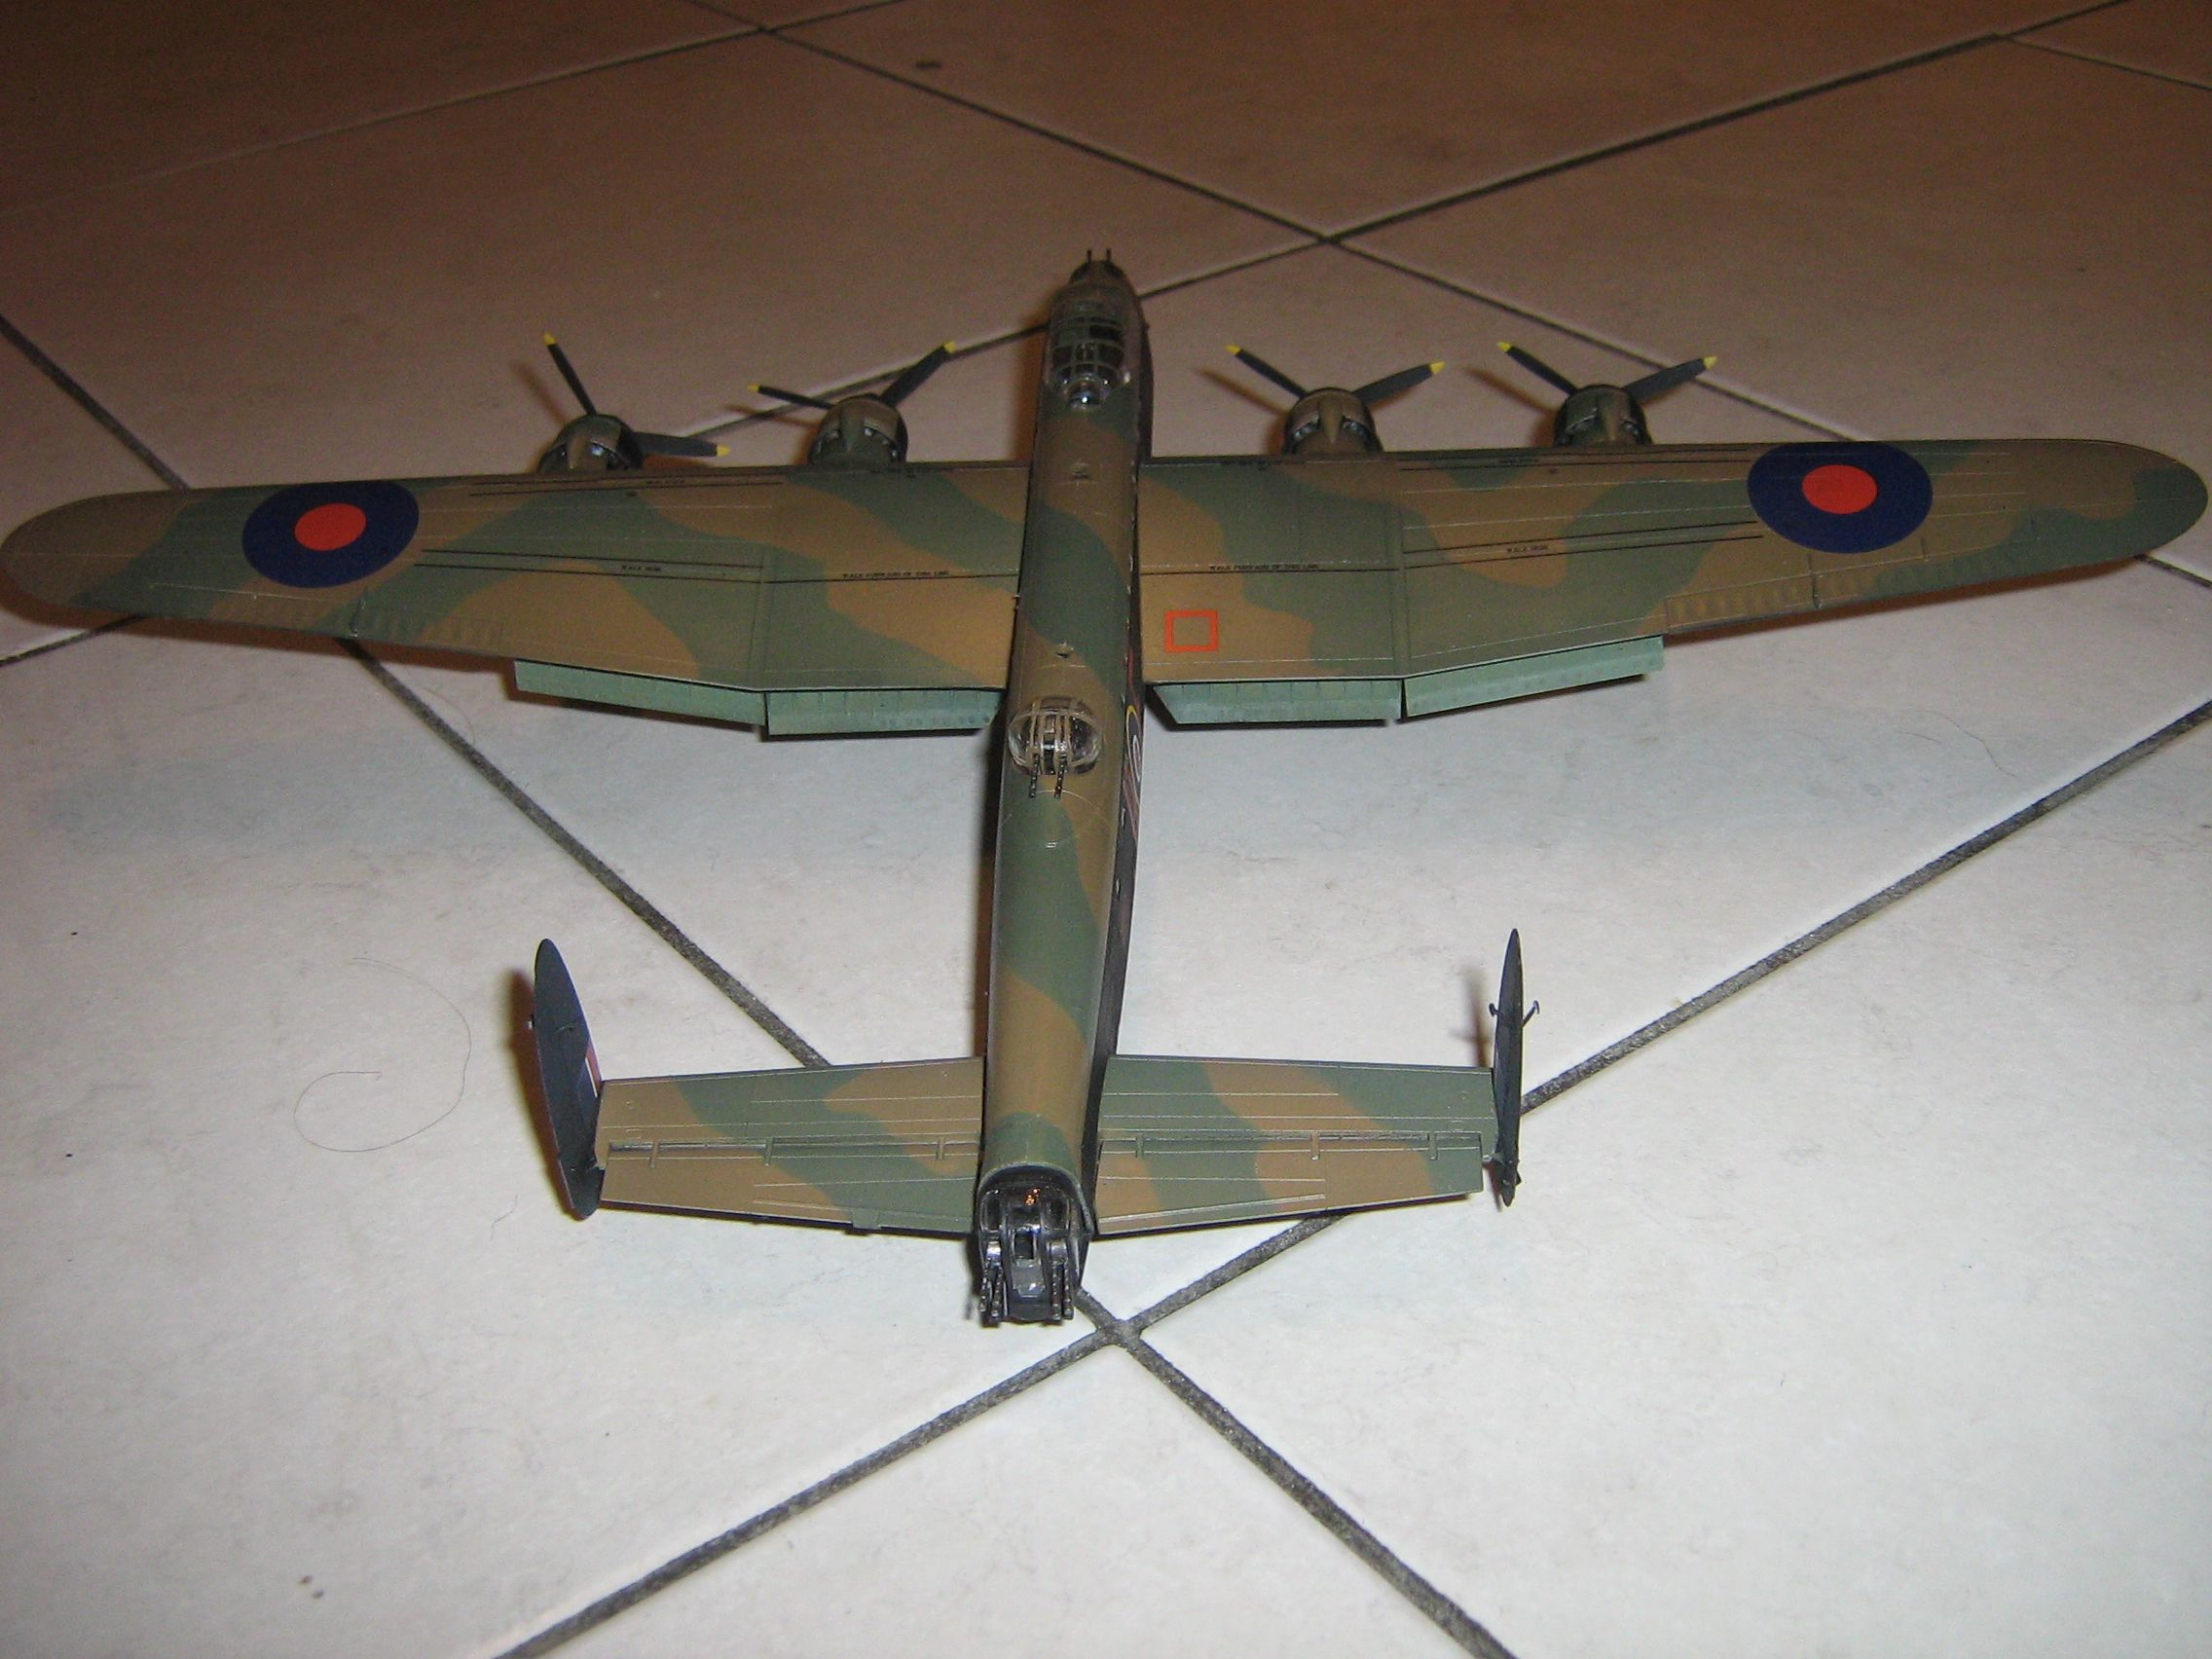 **** FINISHED: - 1/72 Avro Lancaster BII - Aircraft Nose Art GB.-finished-lancaster-3-jpg